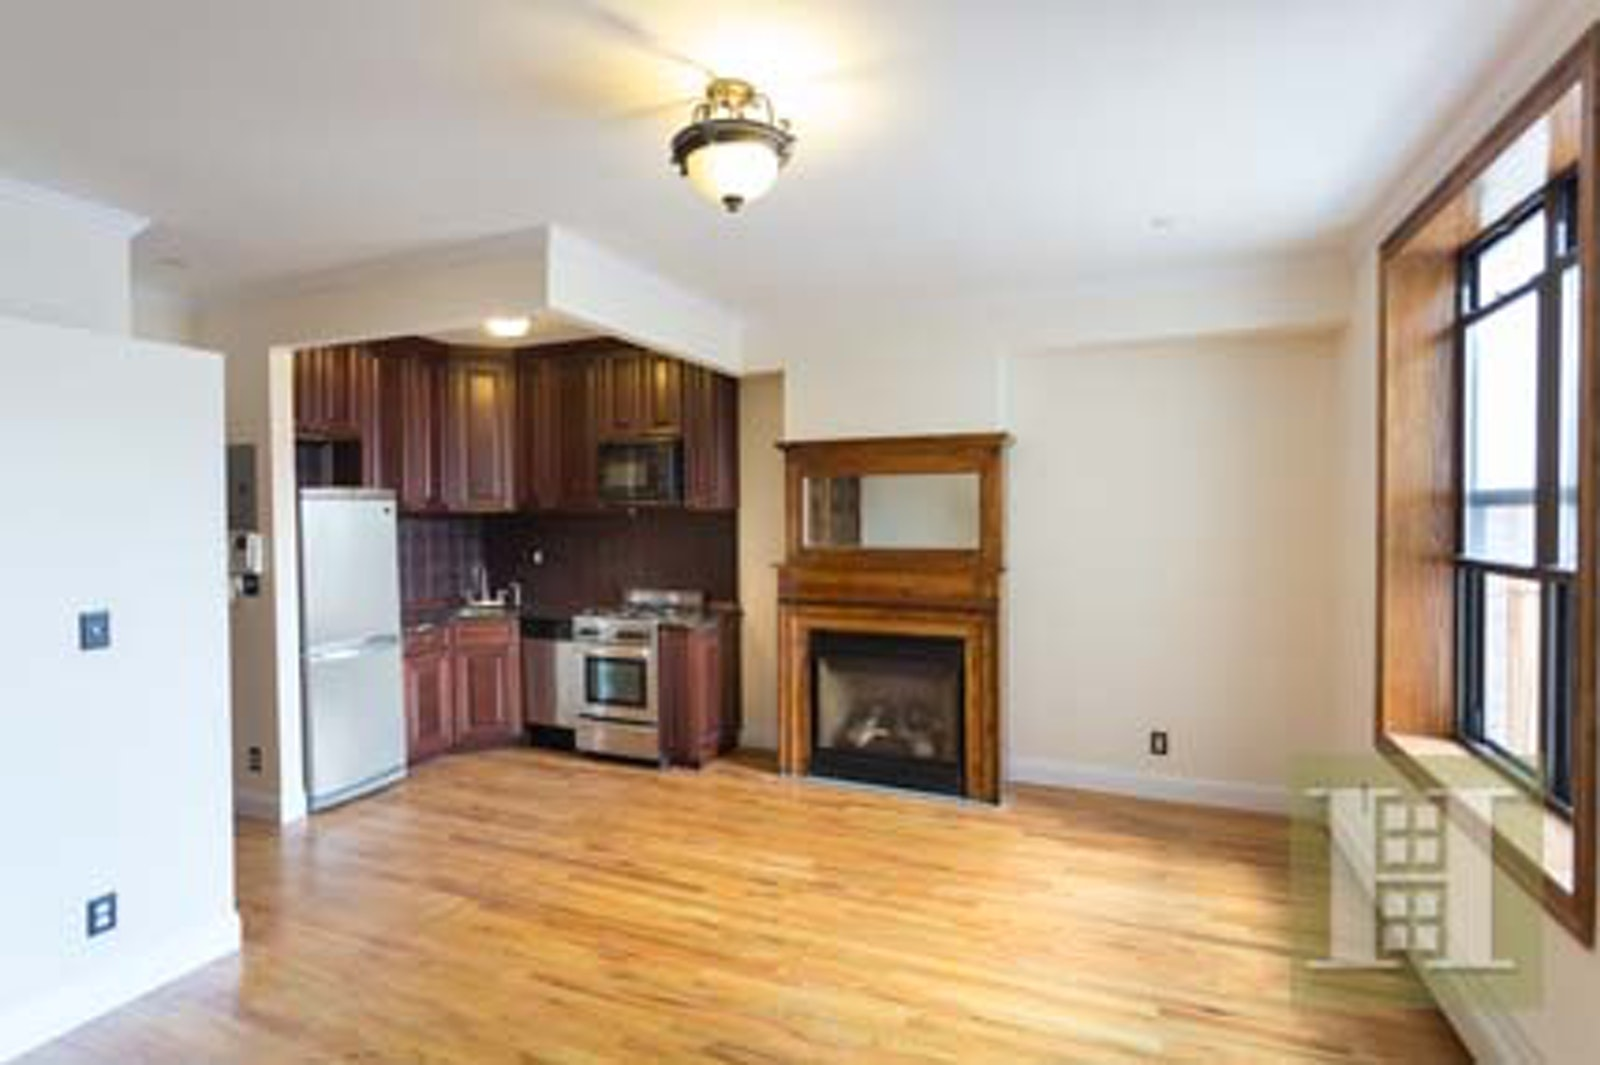 235 WEST 137TH STREET 3R, Harlem, $2,100, Web #: 13634642